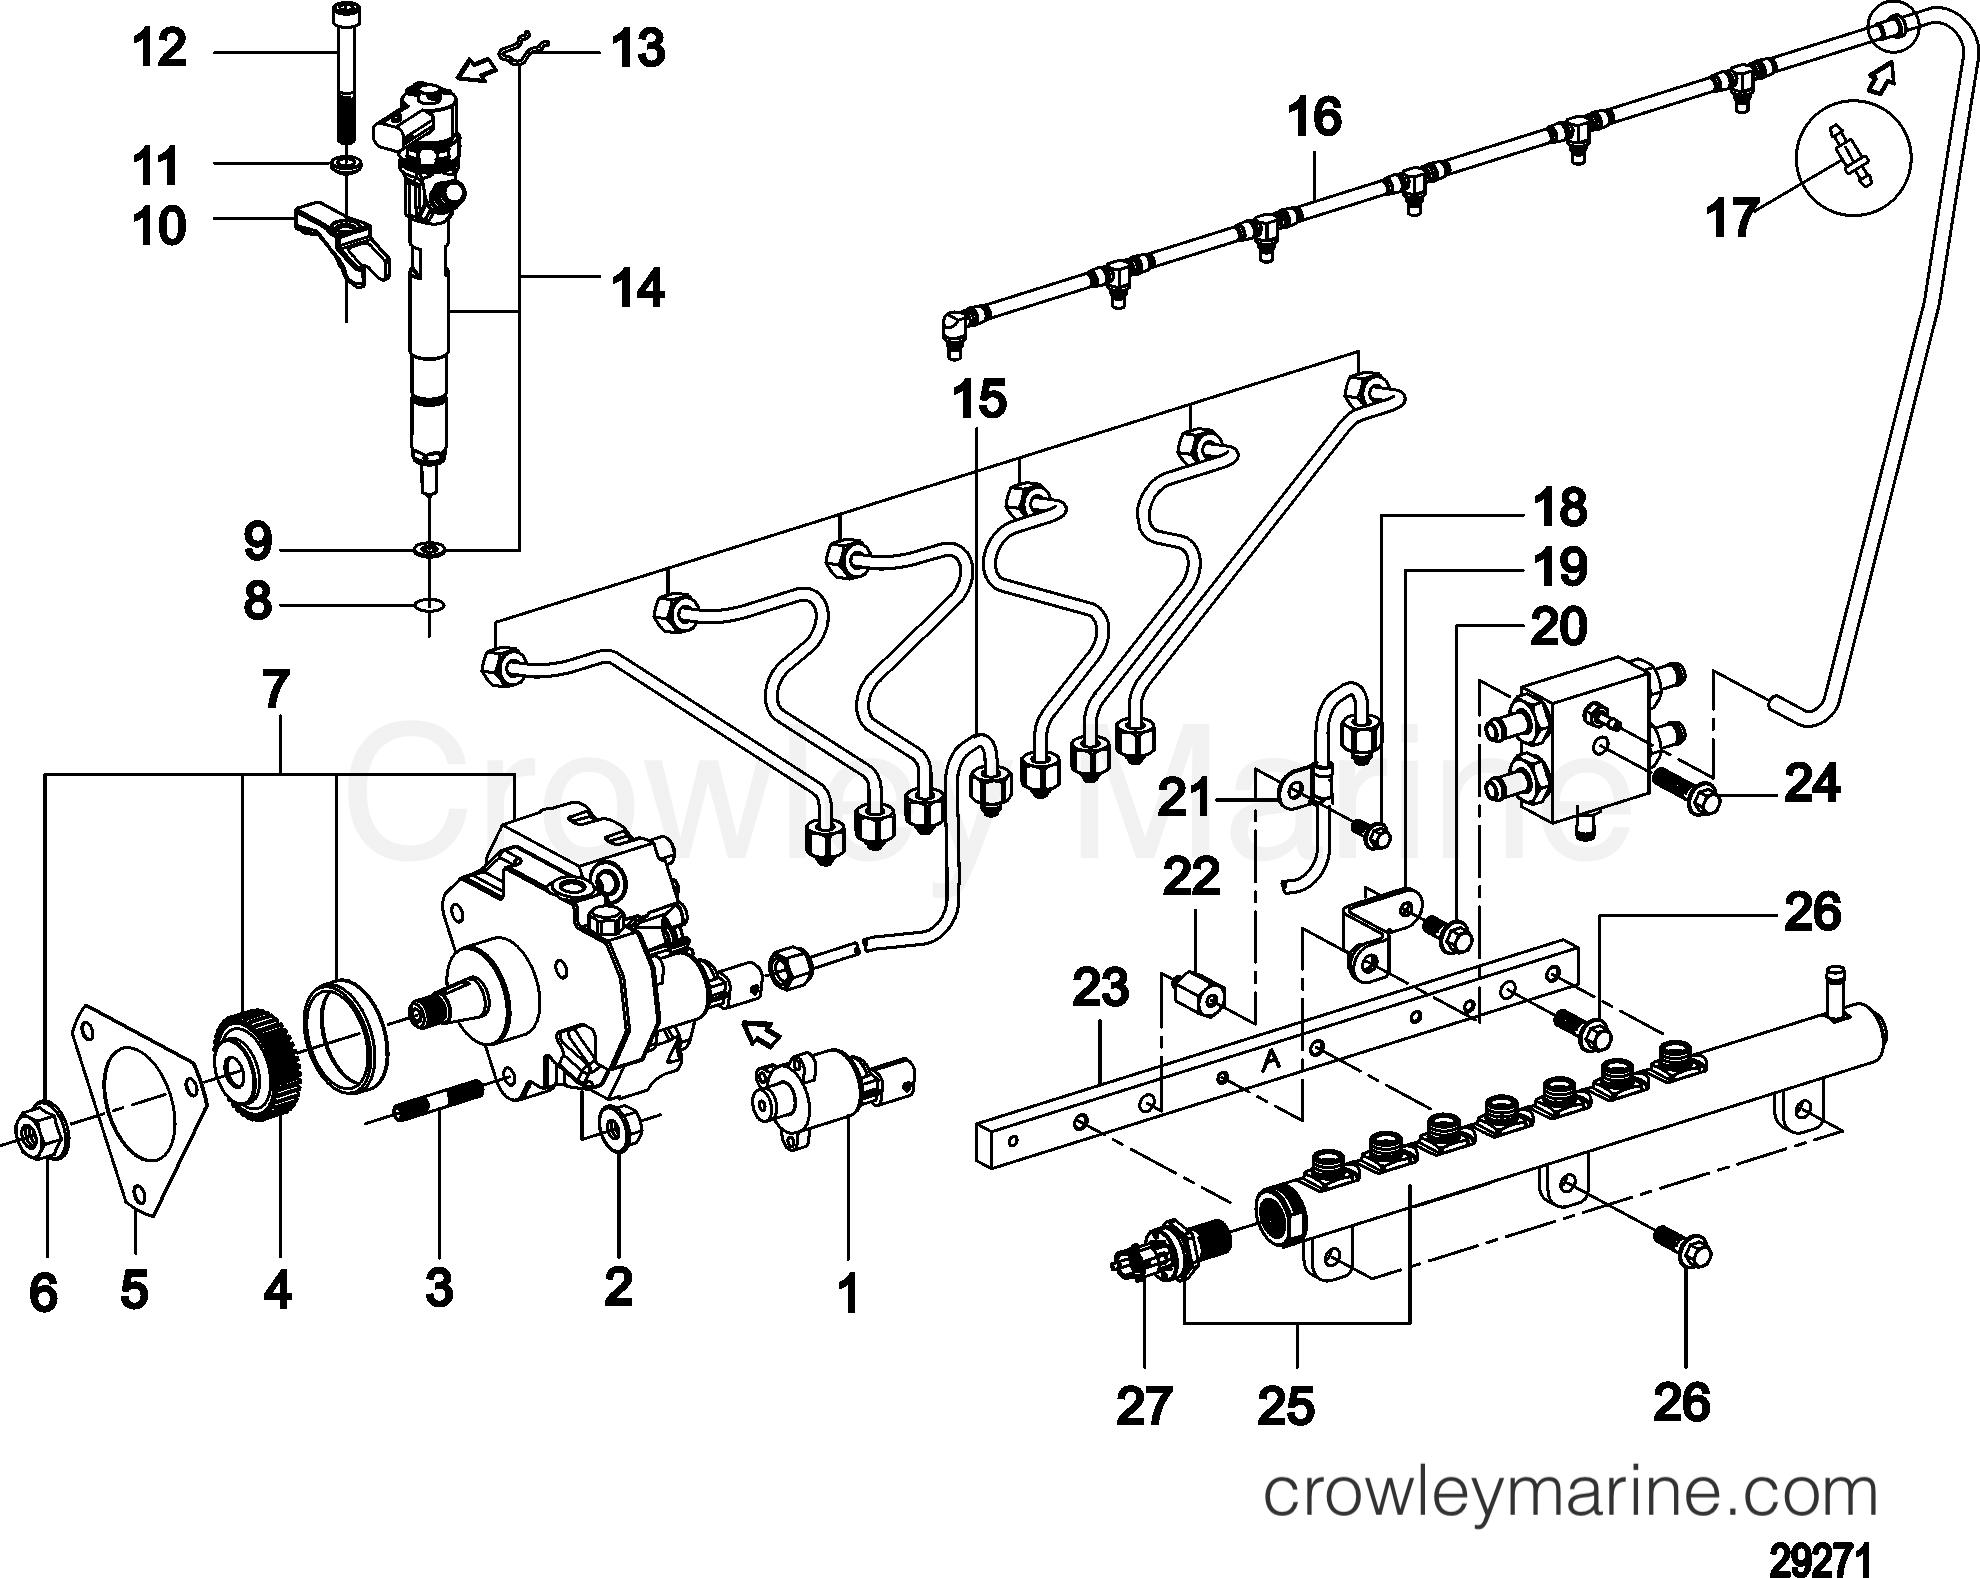 Bk 1562  Re Cummins Isx Wiring Diagrams Please Free Diagram